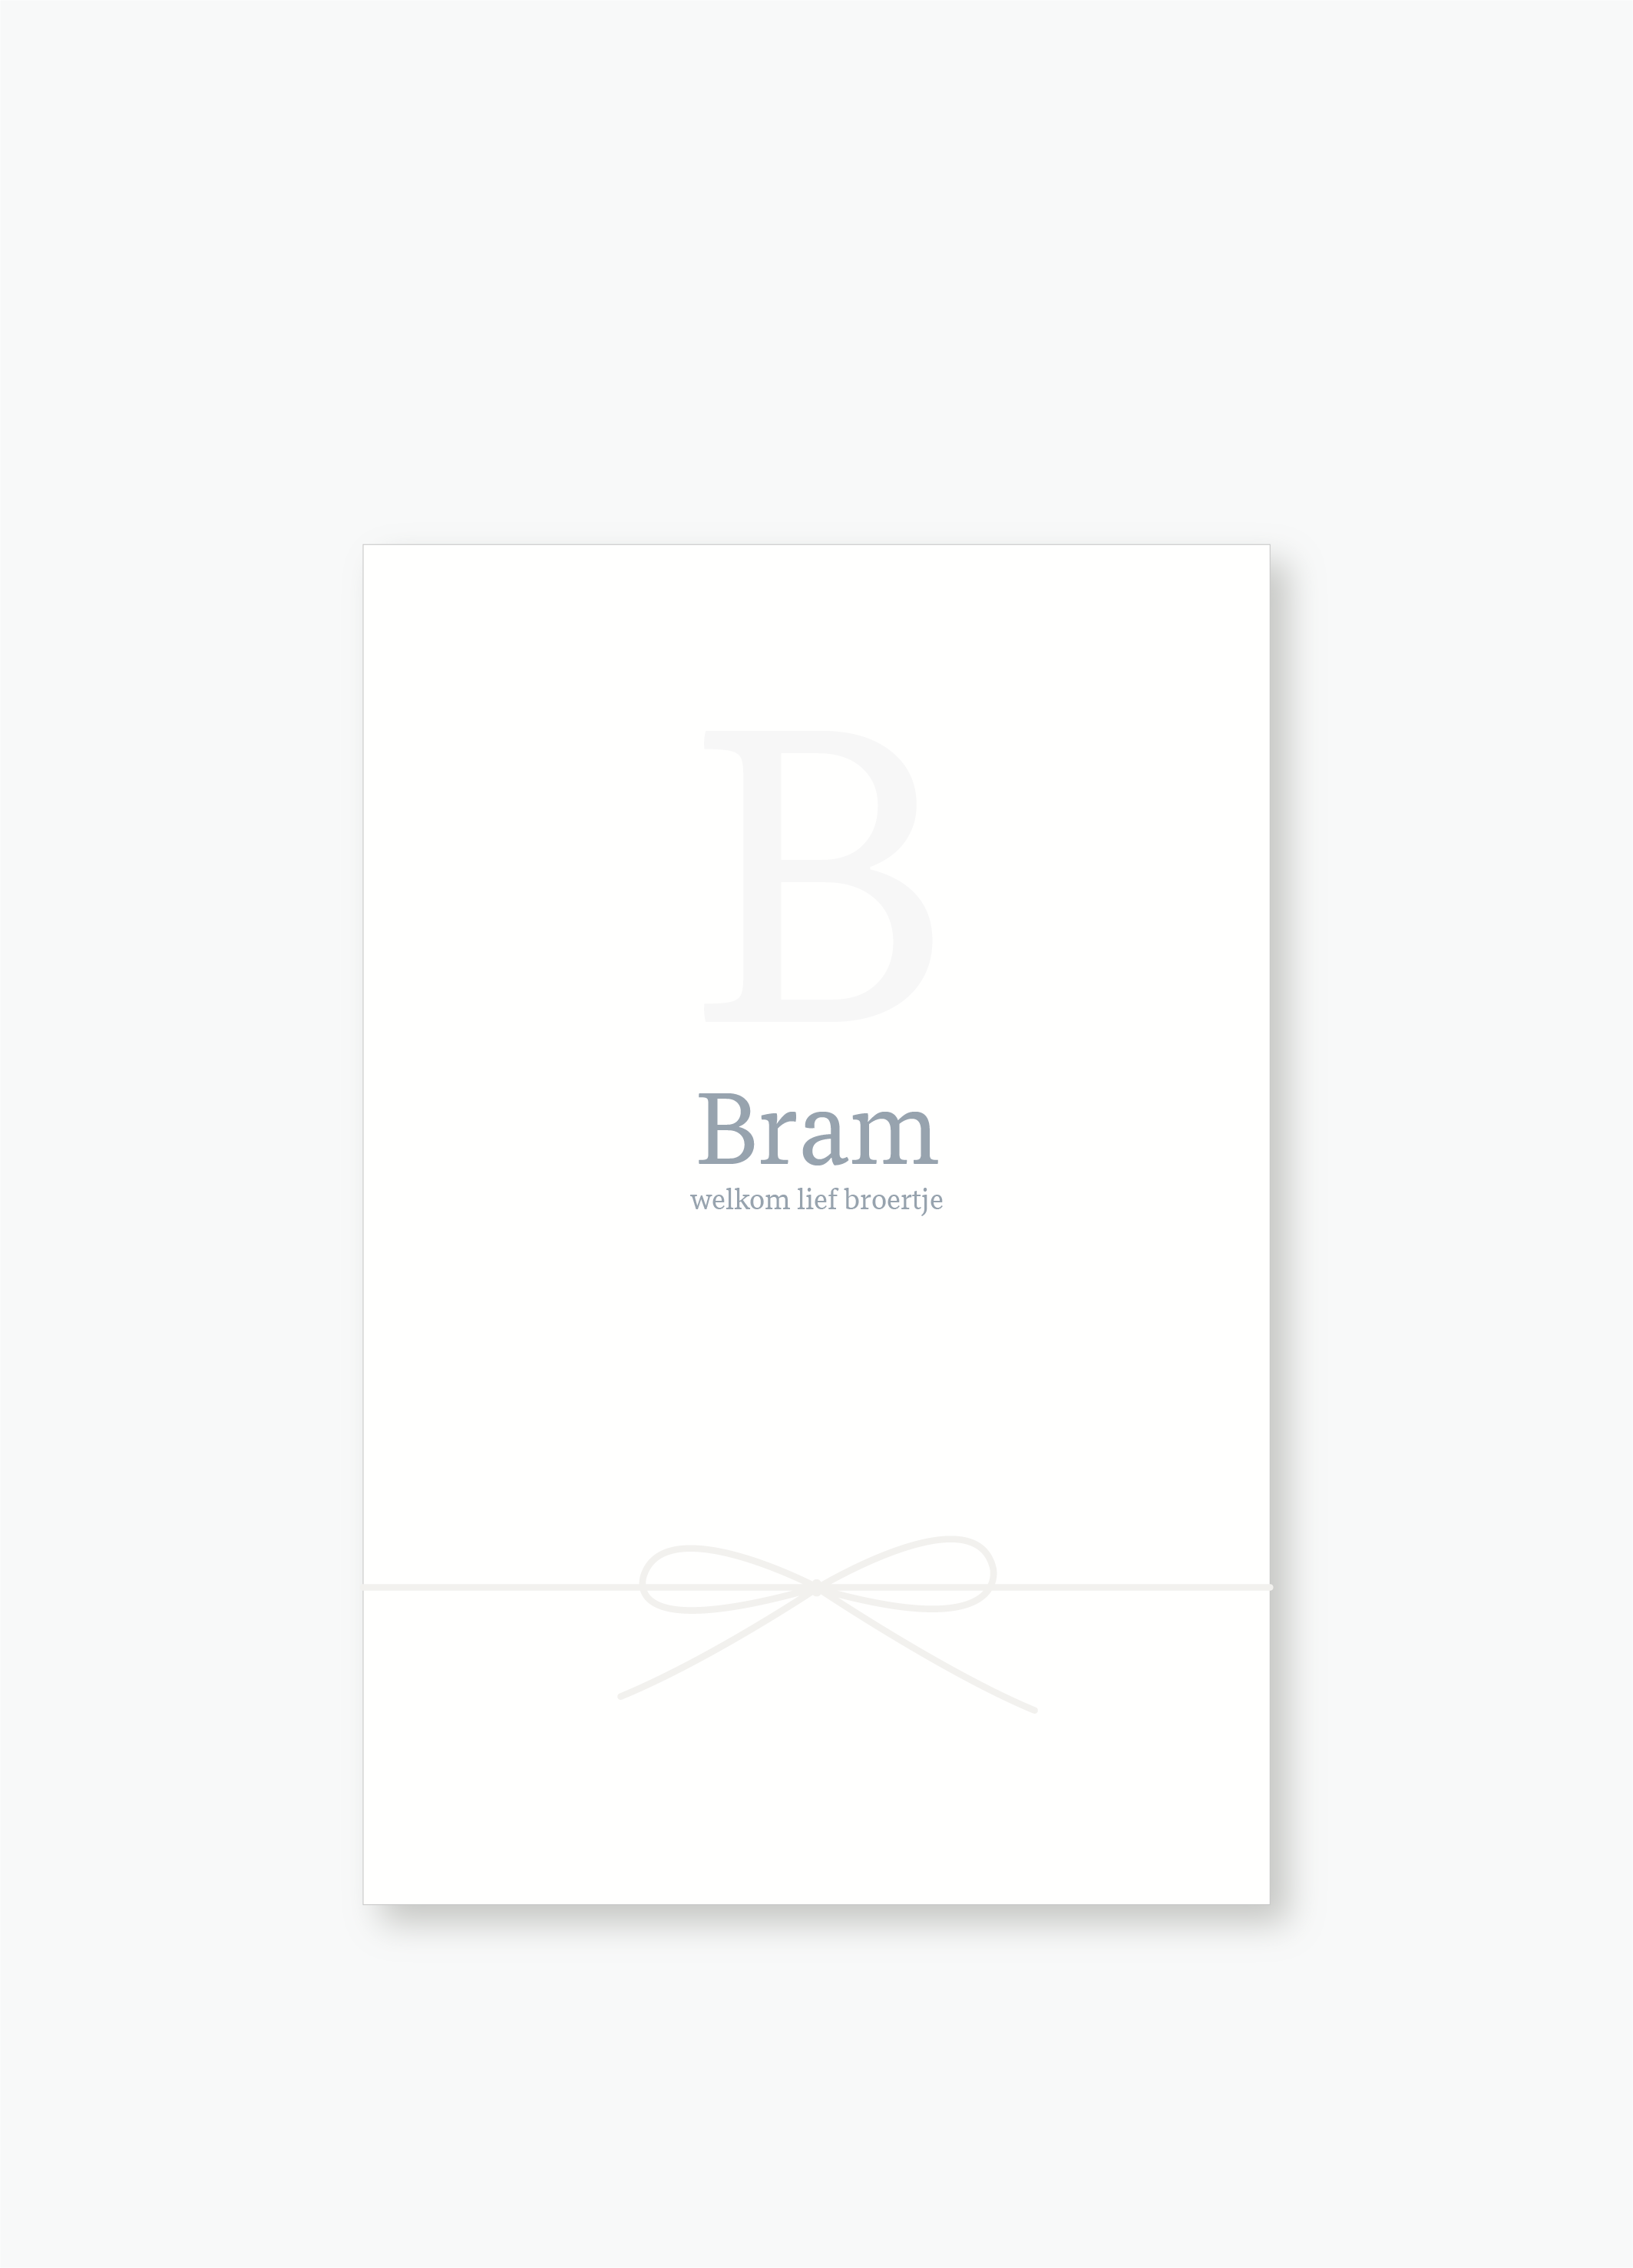 Geboortekaartje Bram | Studio Moose